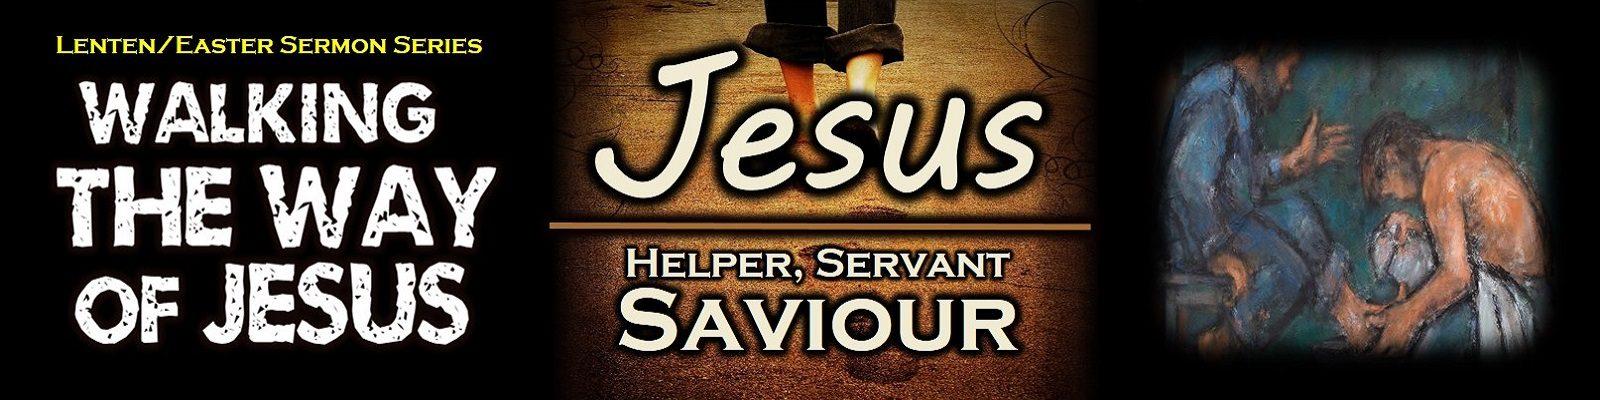 The Way Study #2 - Jesus Helper Saviour